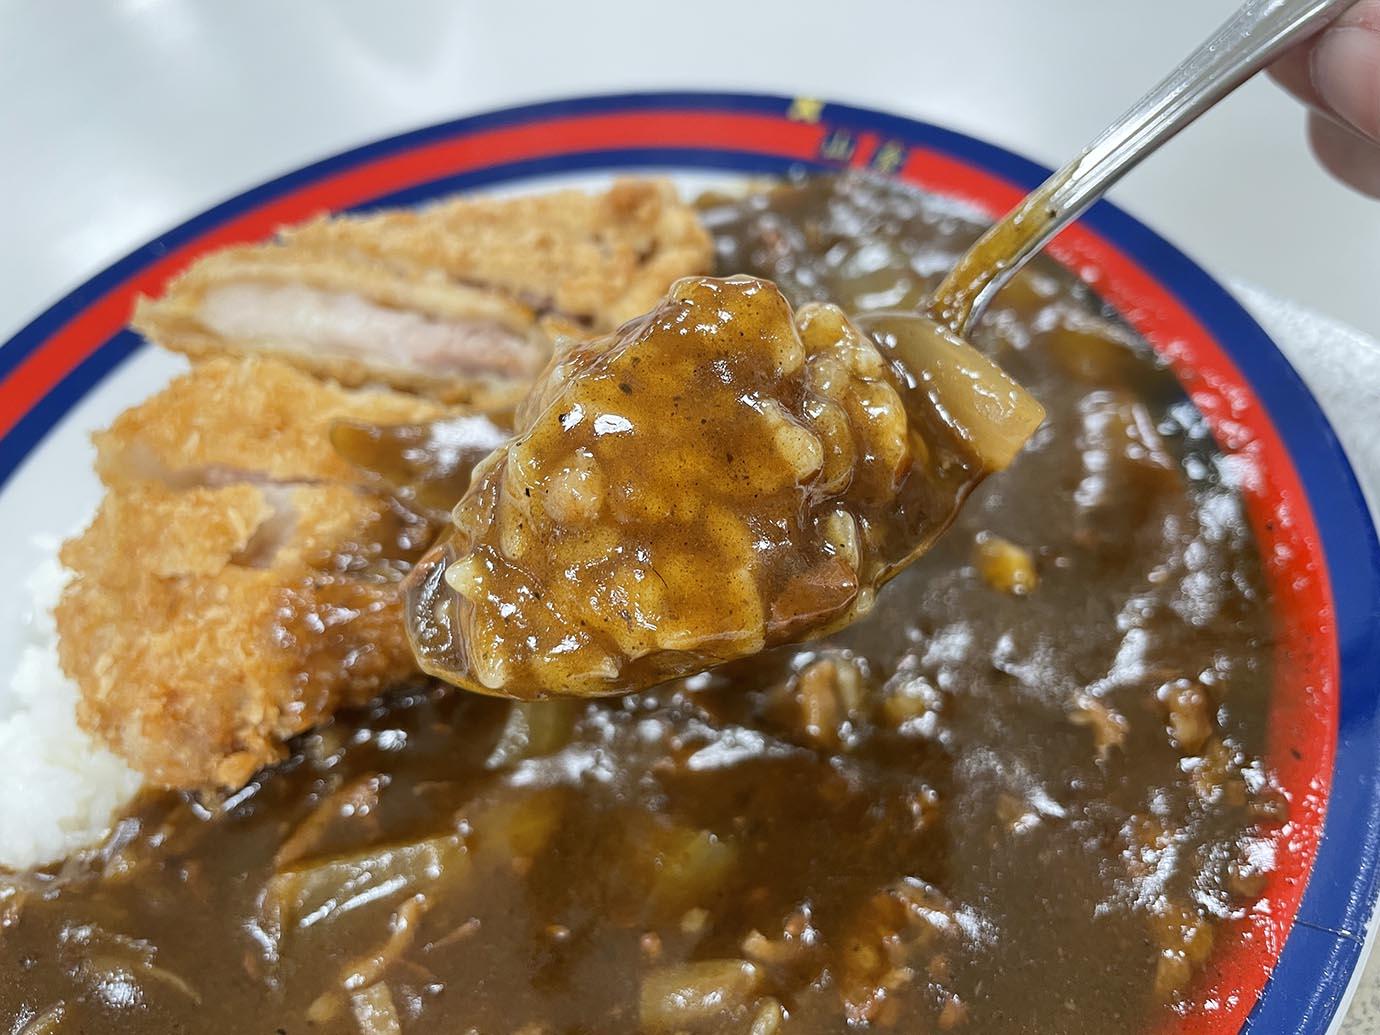 keio-university-cafeteria-pork-cutlet3